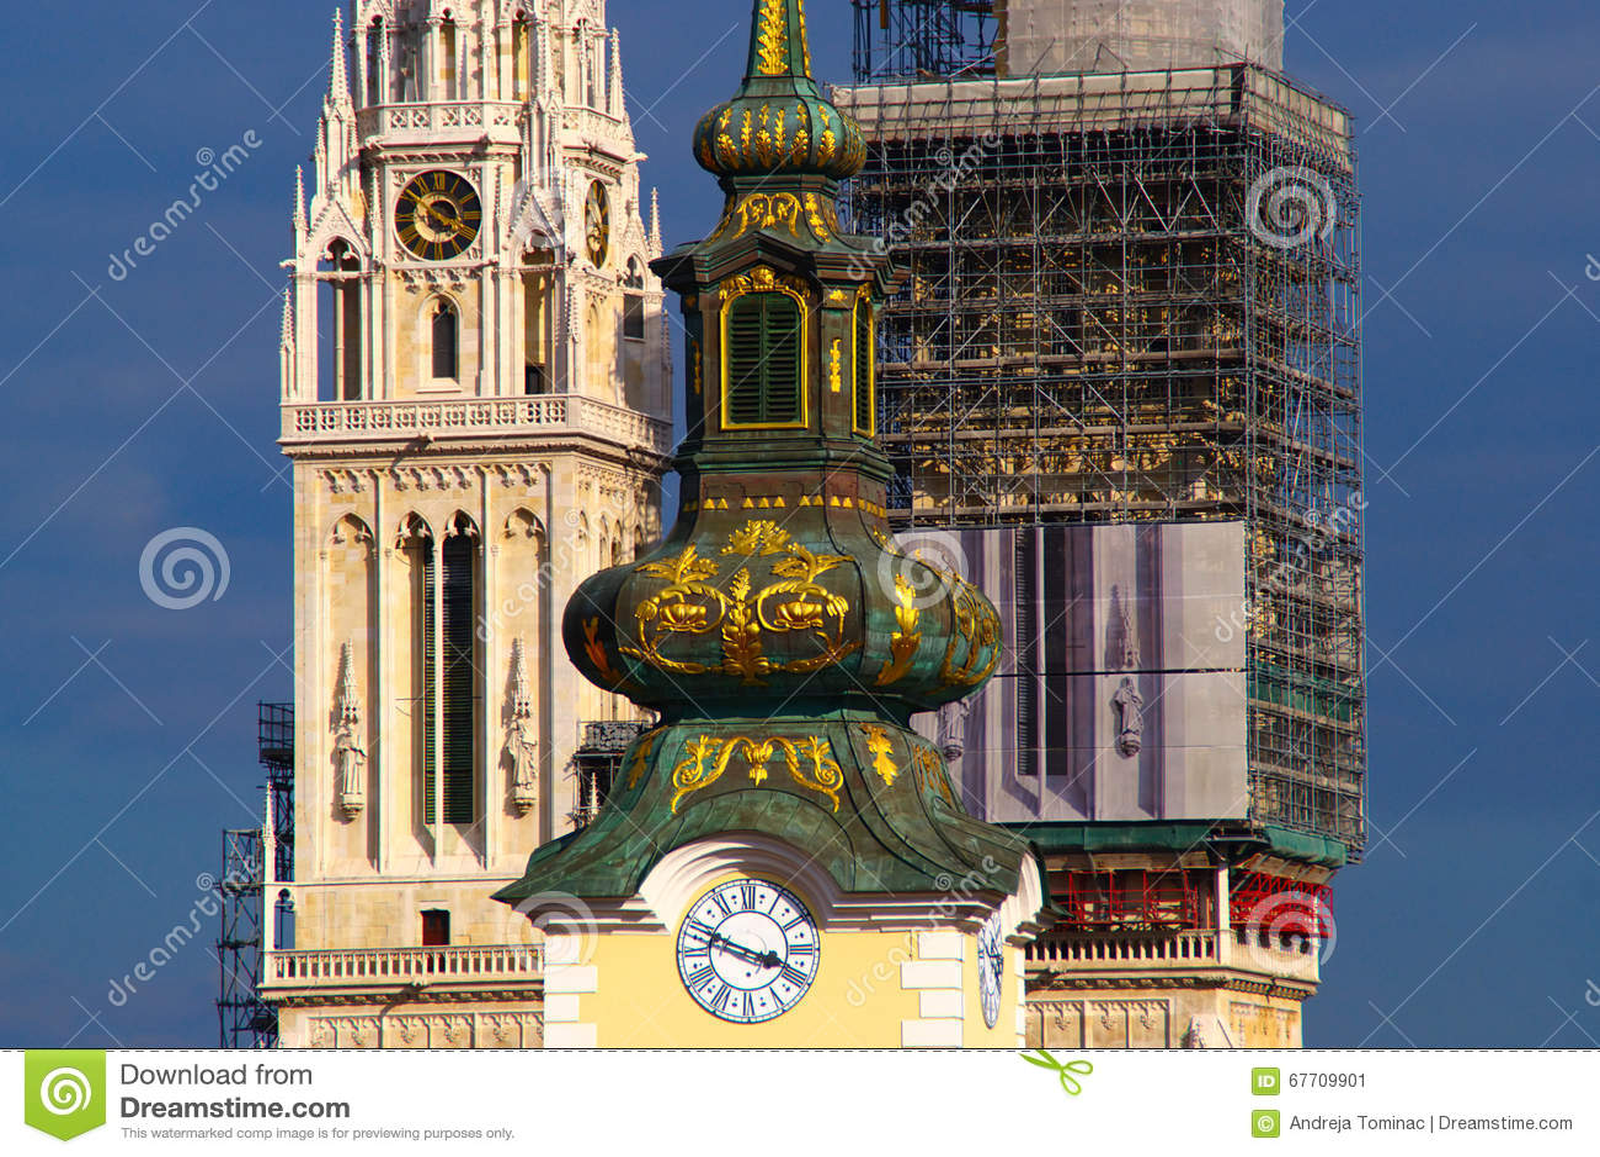 Arhitecture barroco y gótico, Zagreb, Croacia